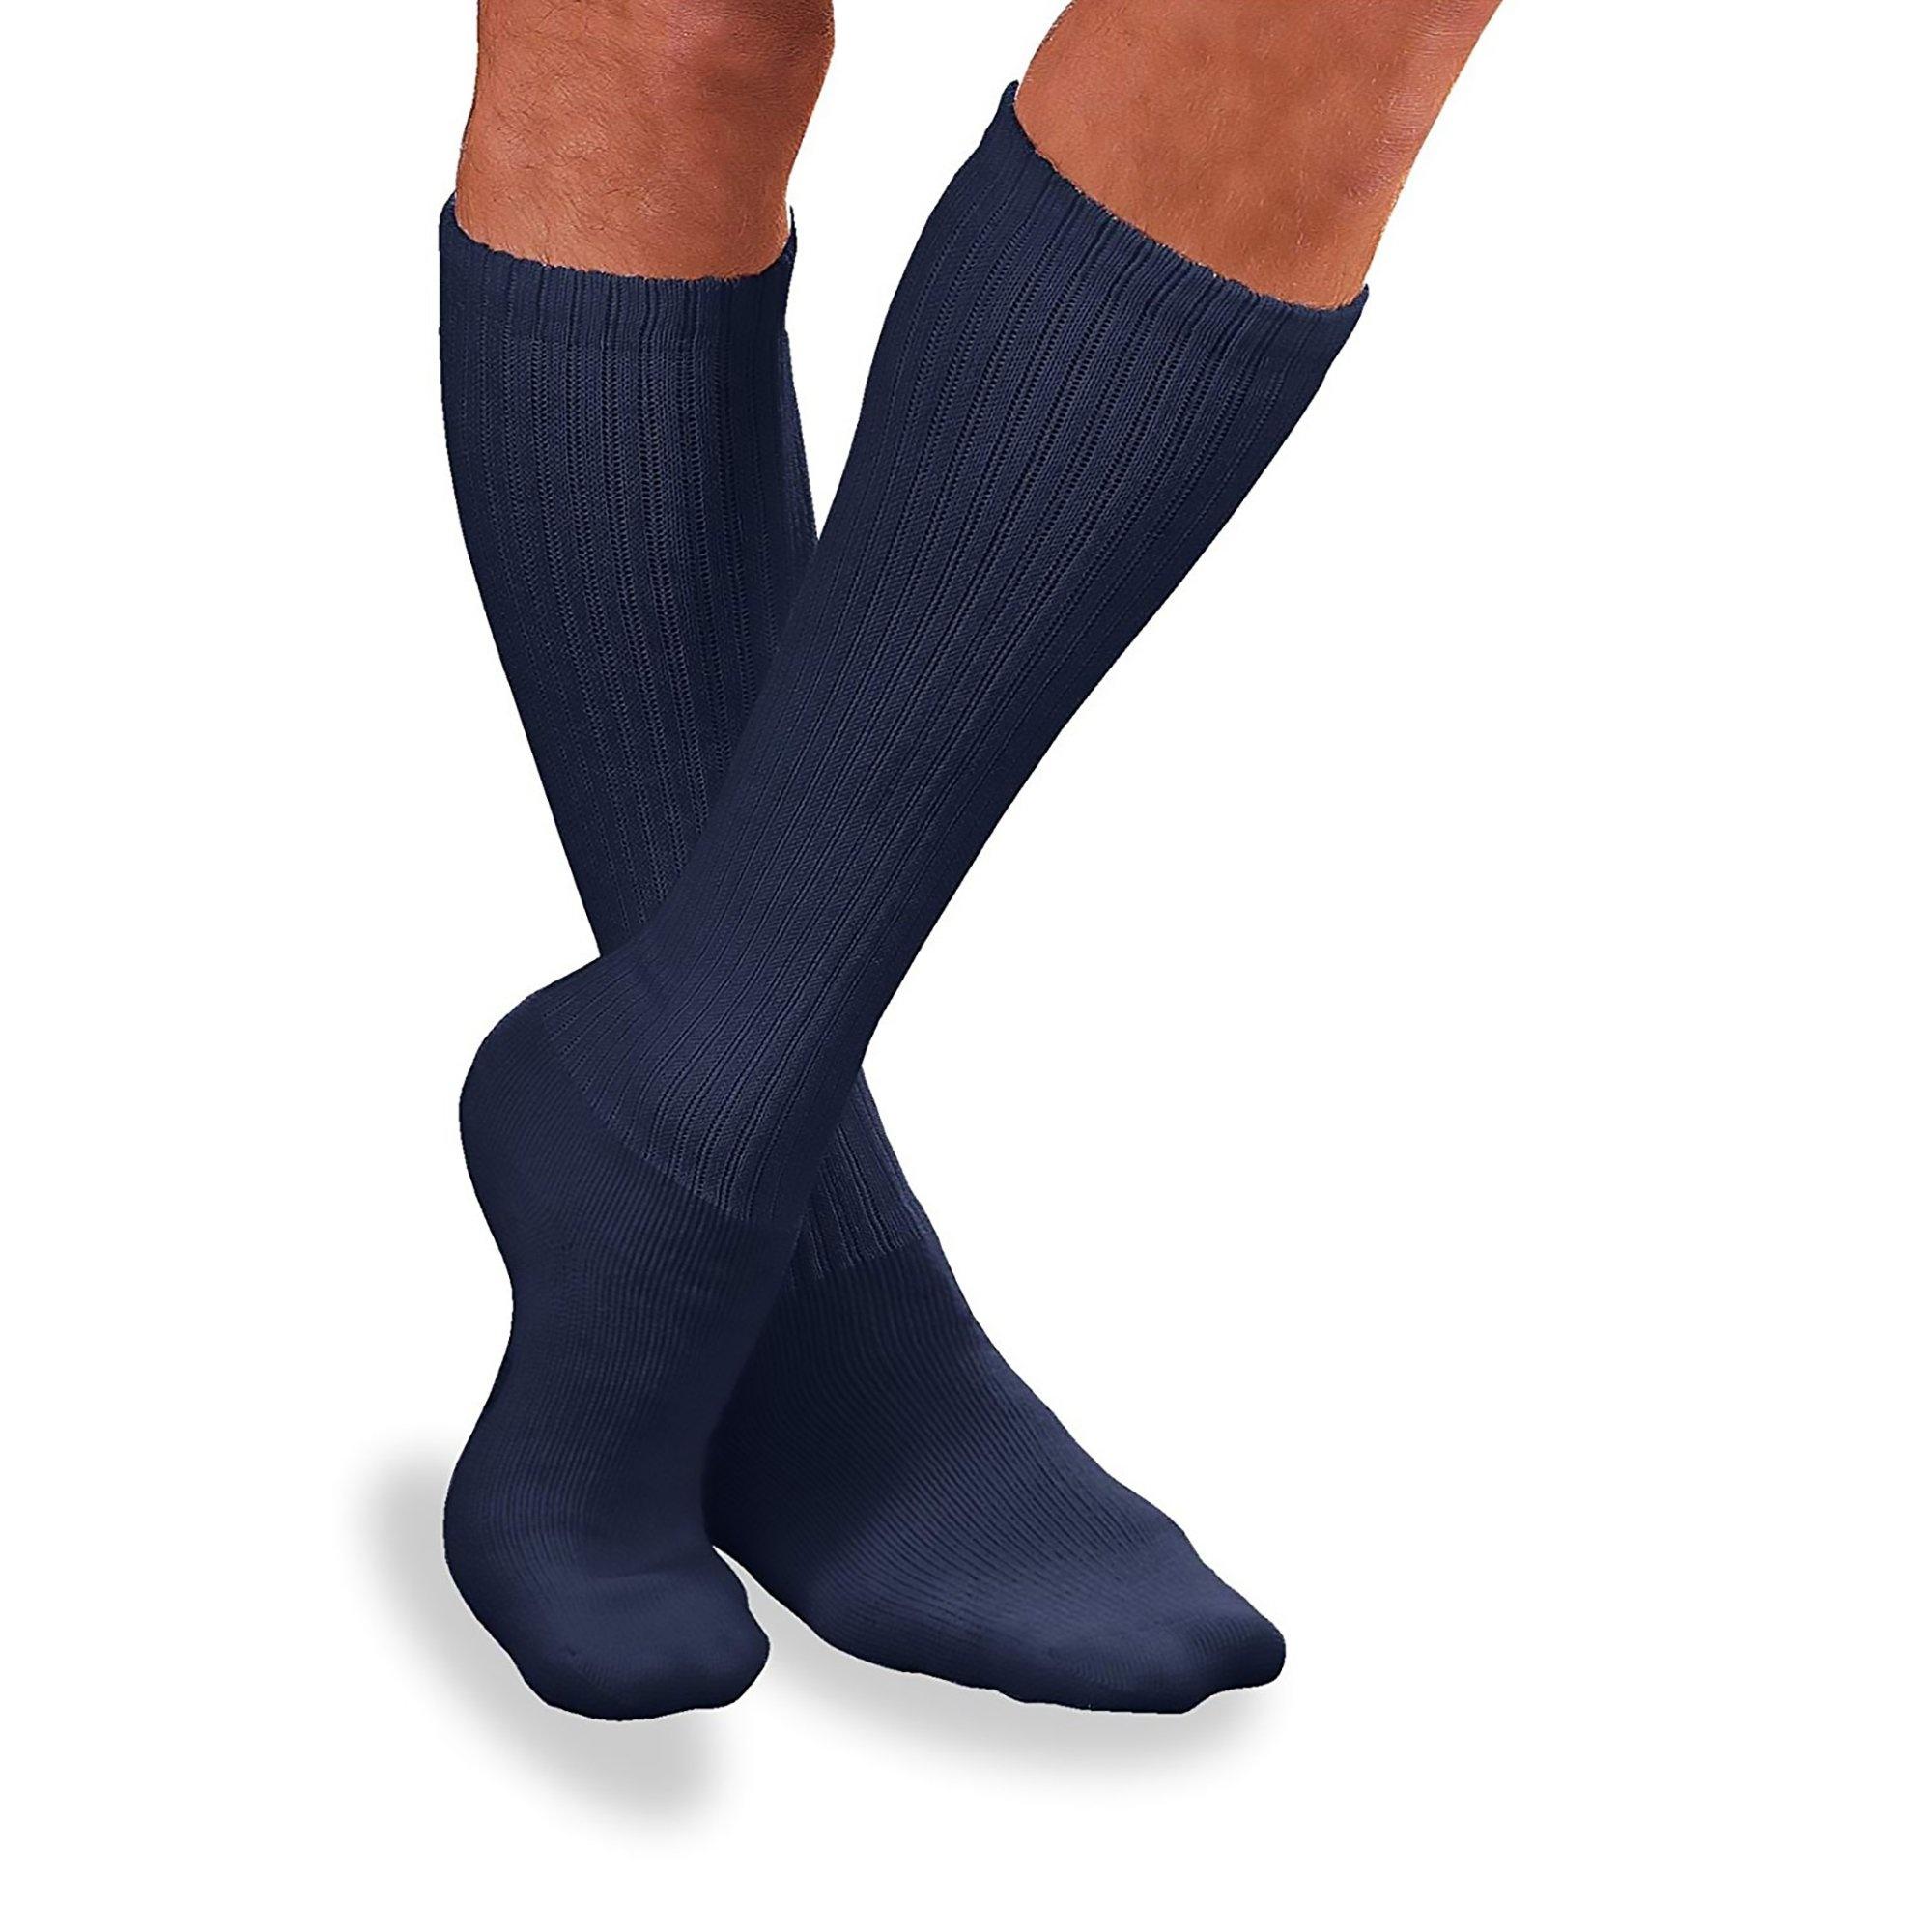 JOBST Sensifoot Crew Length Diabetic Compression Socks, 8-15 mmHg, 110848, Navy - Large - 1 Pair